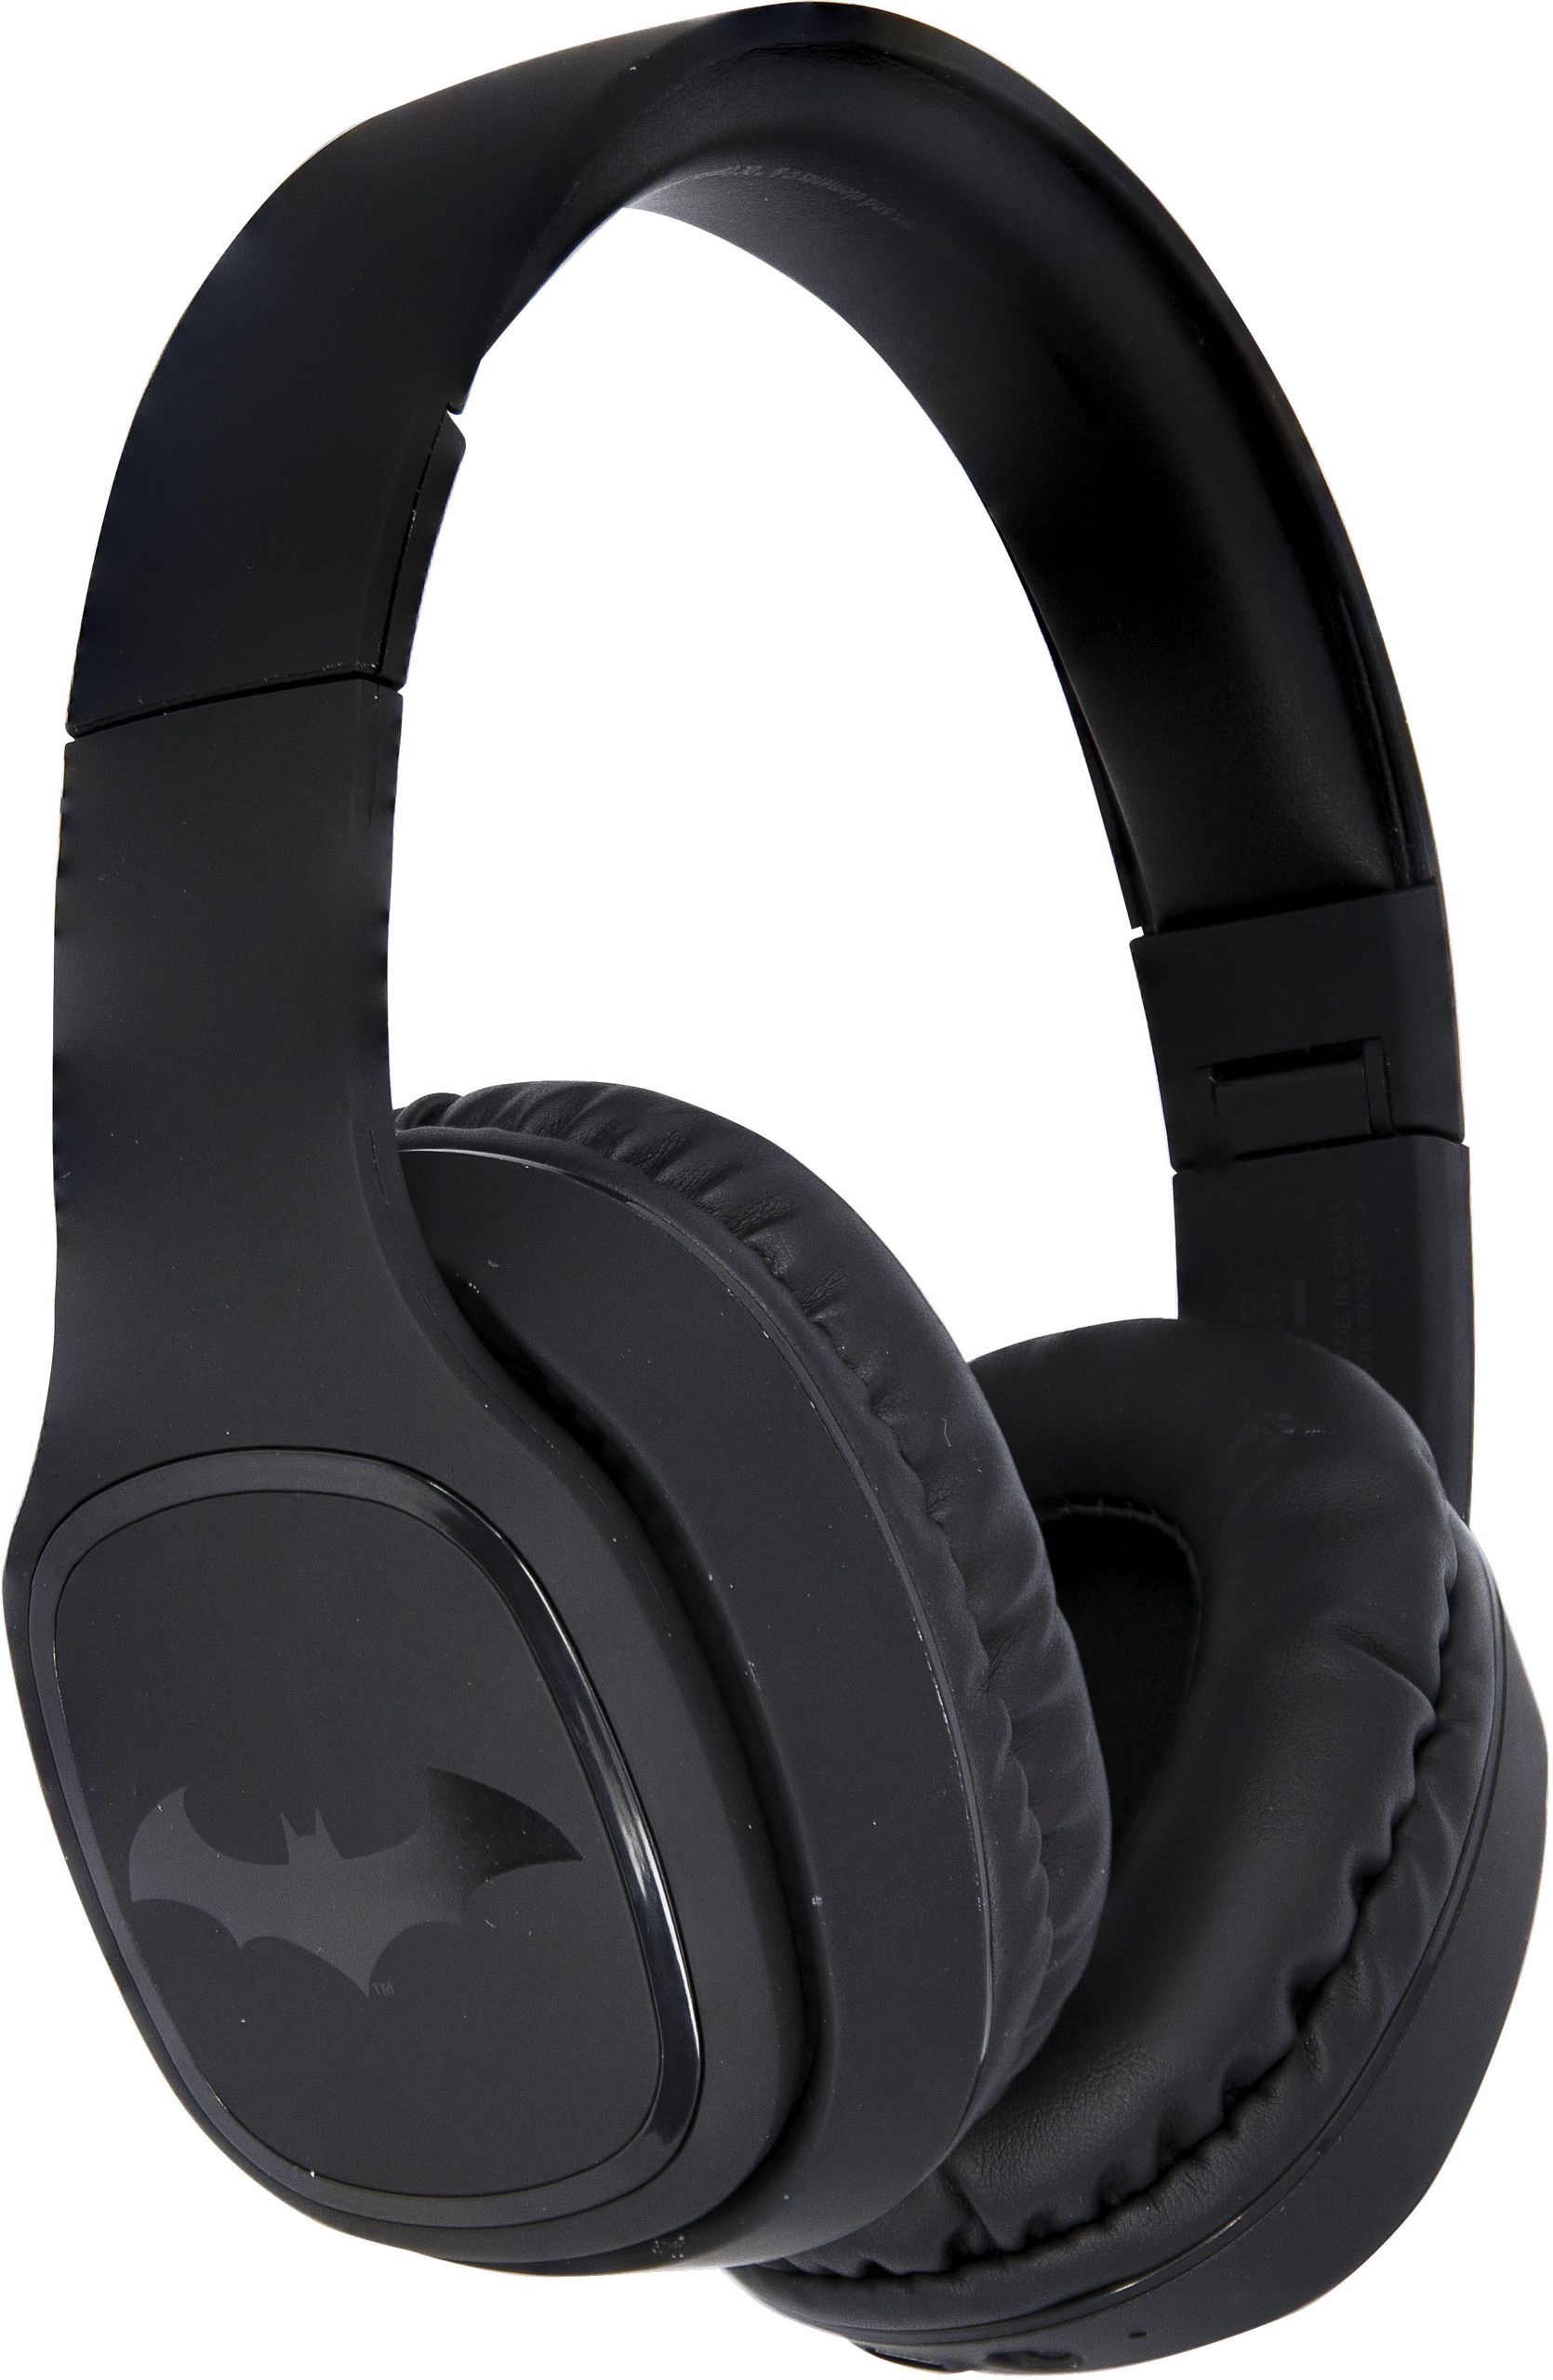 Batman Dark Knight Wireless Headphones